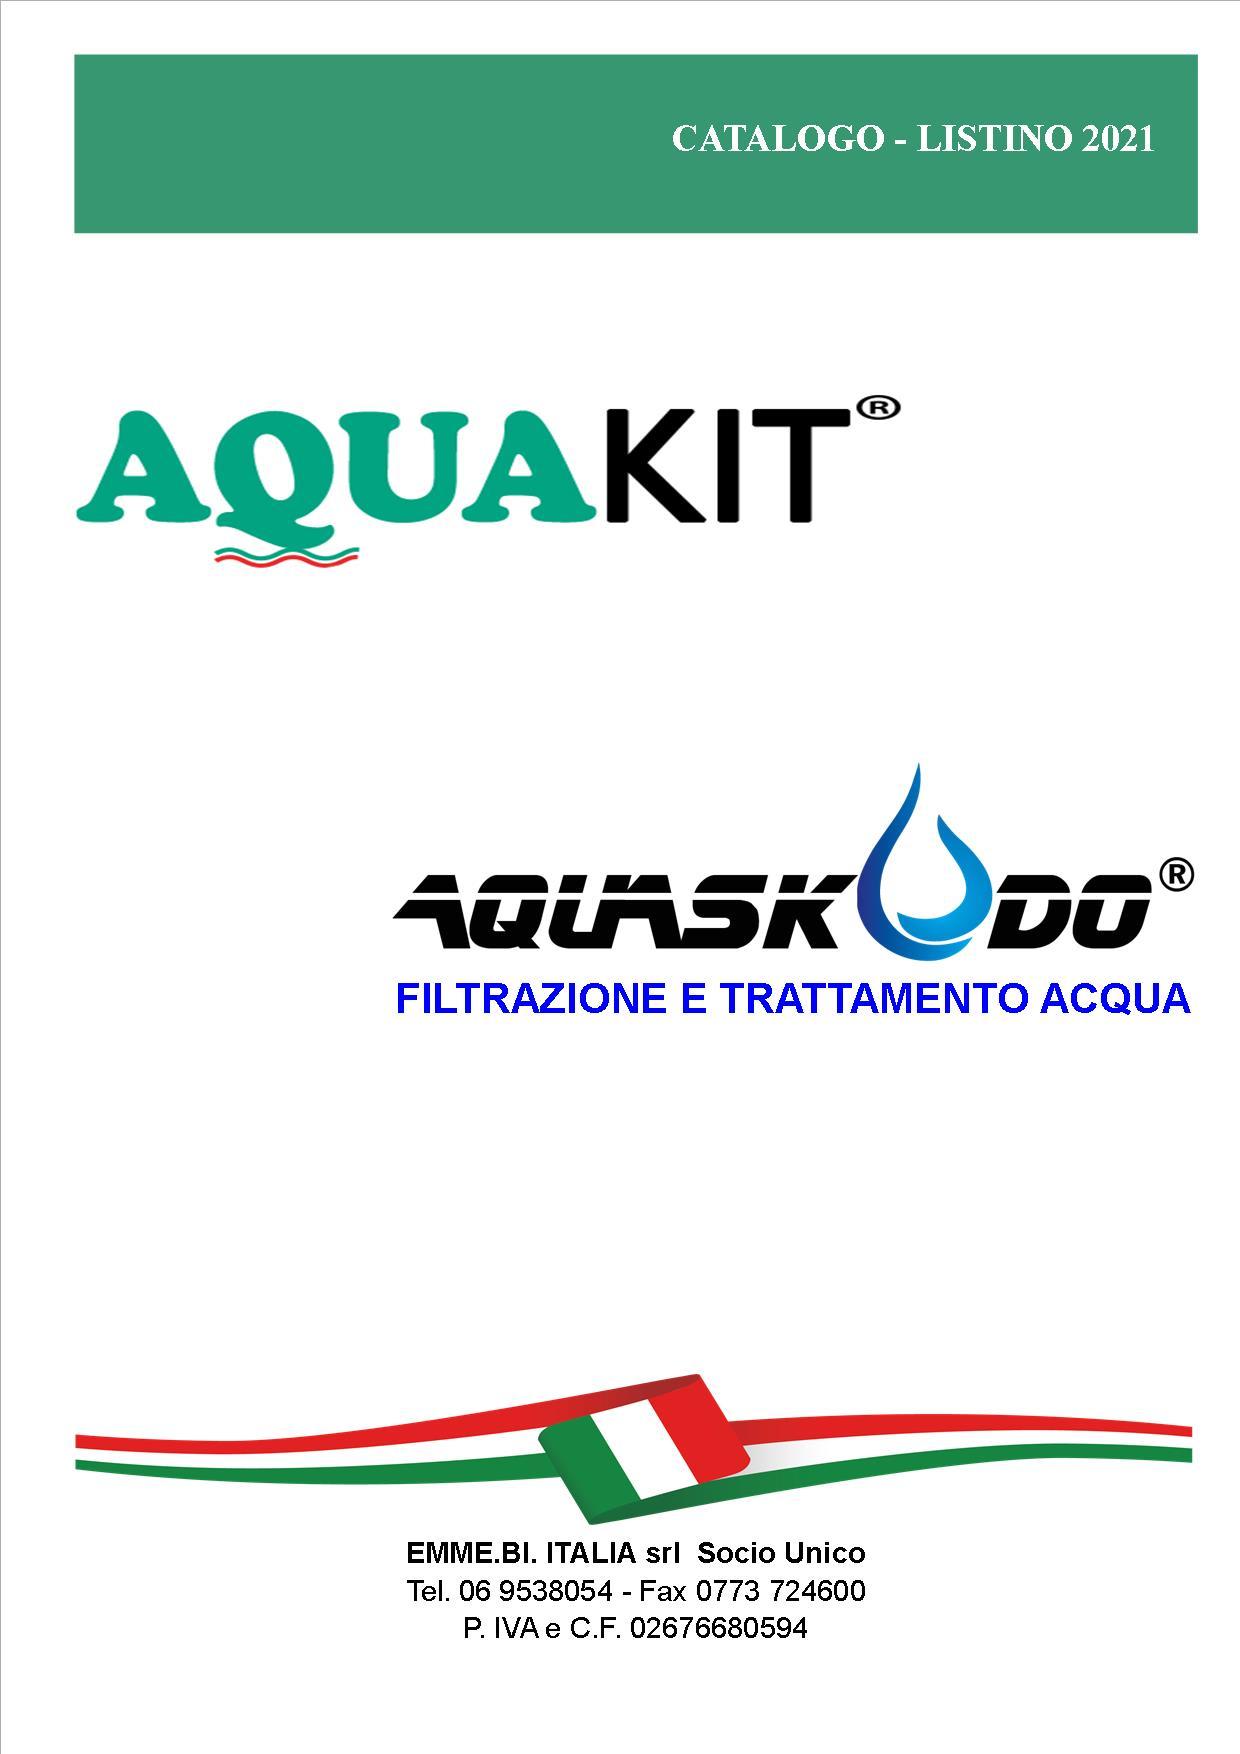 Catalogo Aquakit 2021